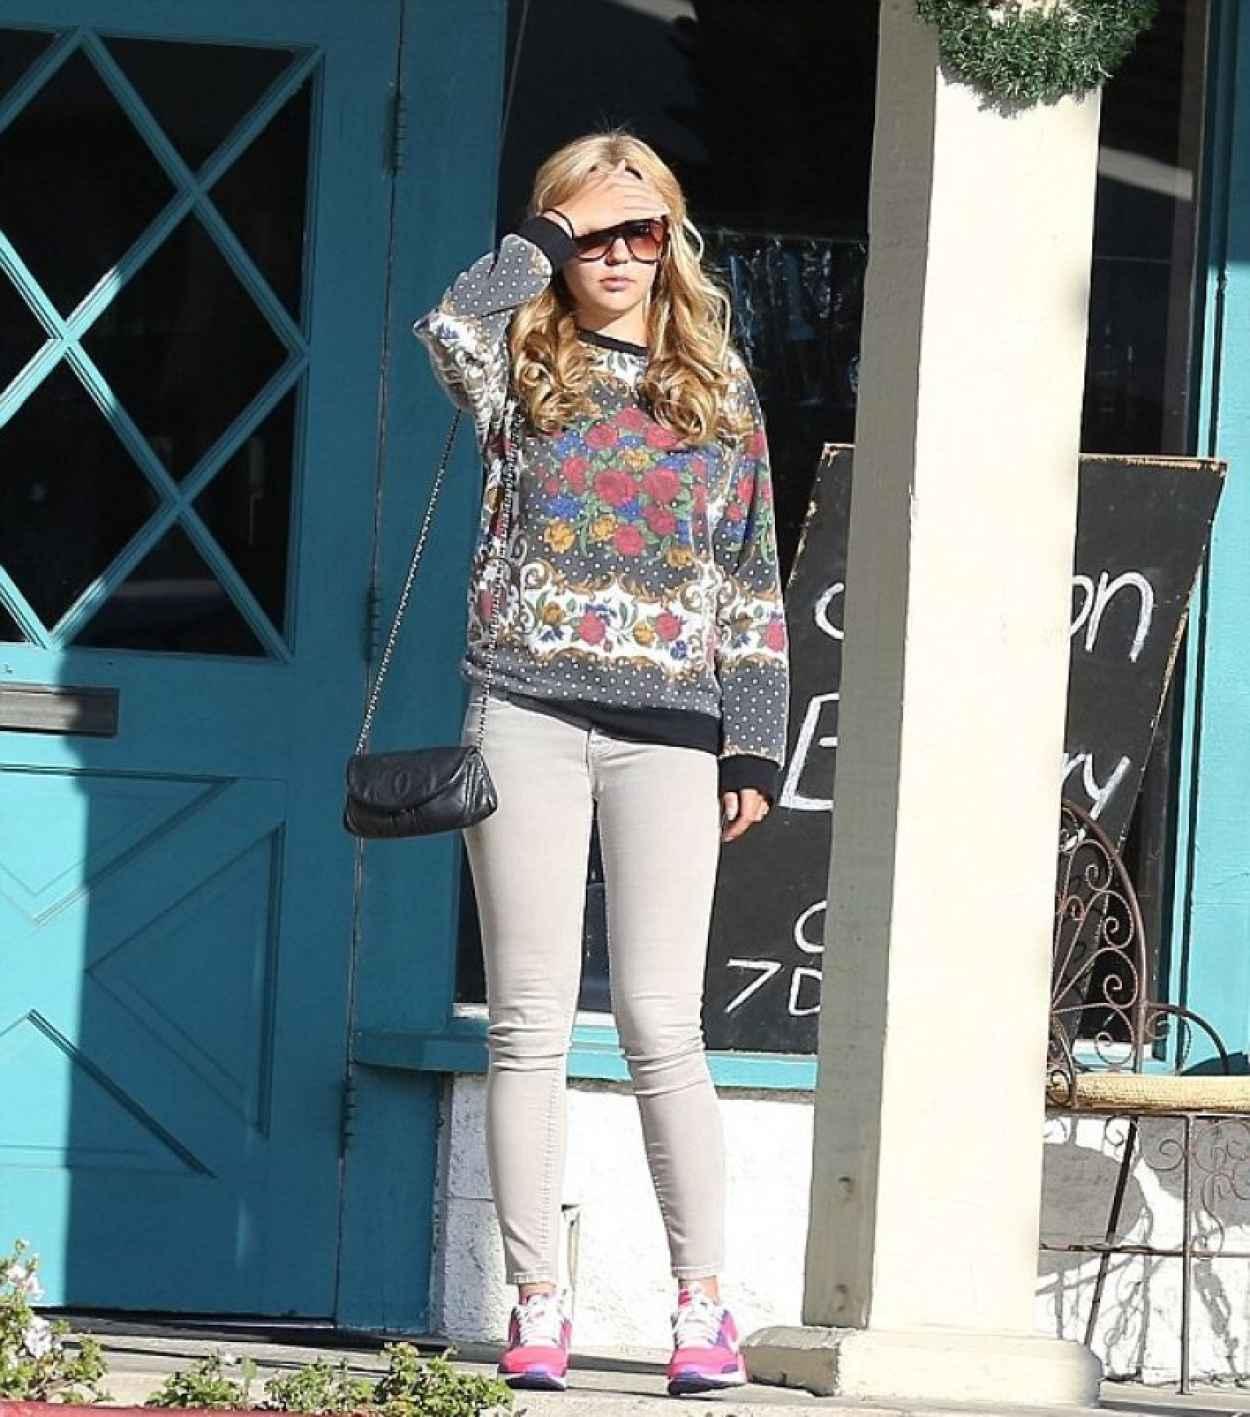 Amanda Bynes Street Style - Shopping in Los Angeles - Dec. 2015-1